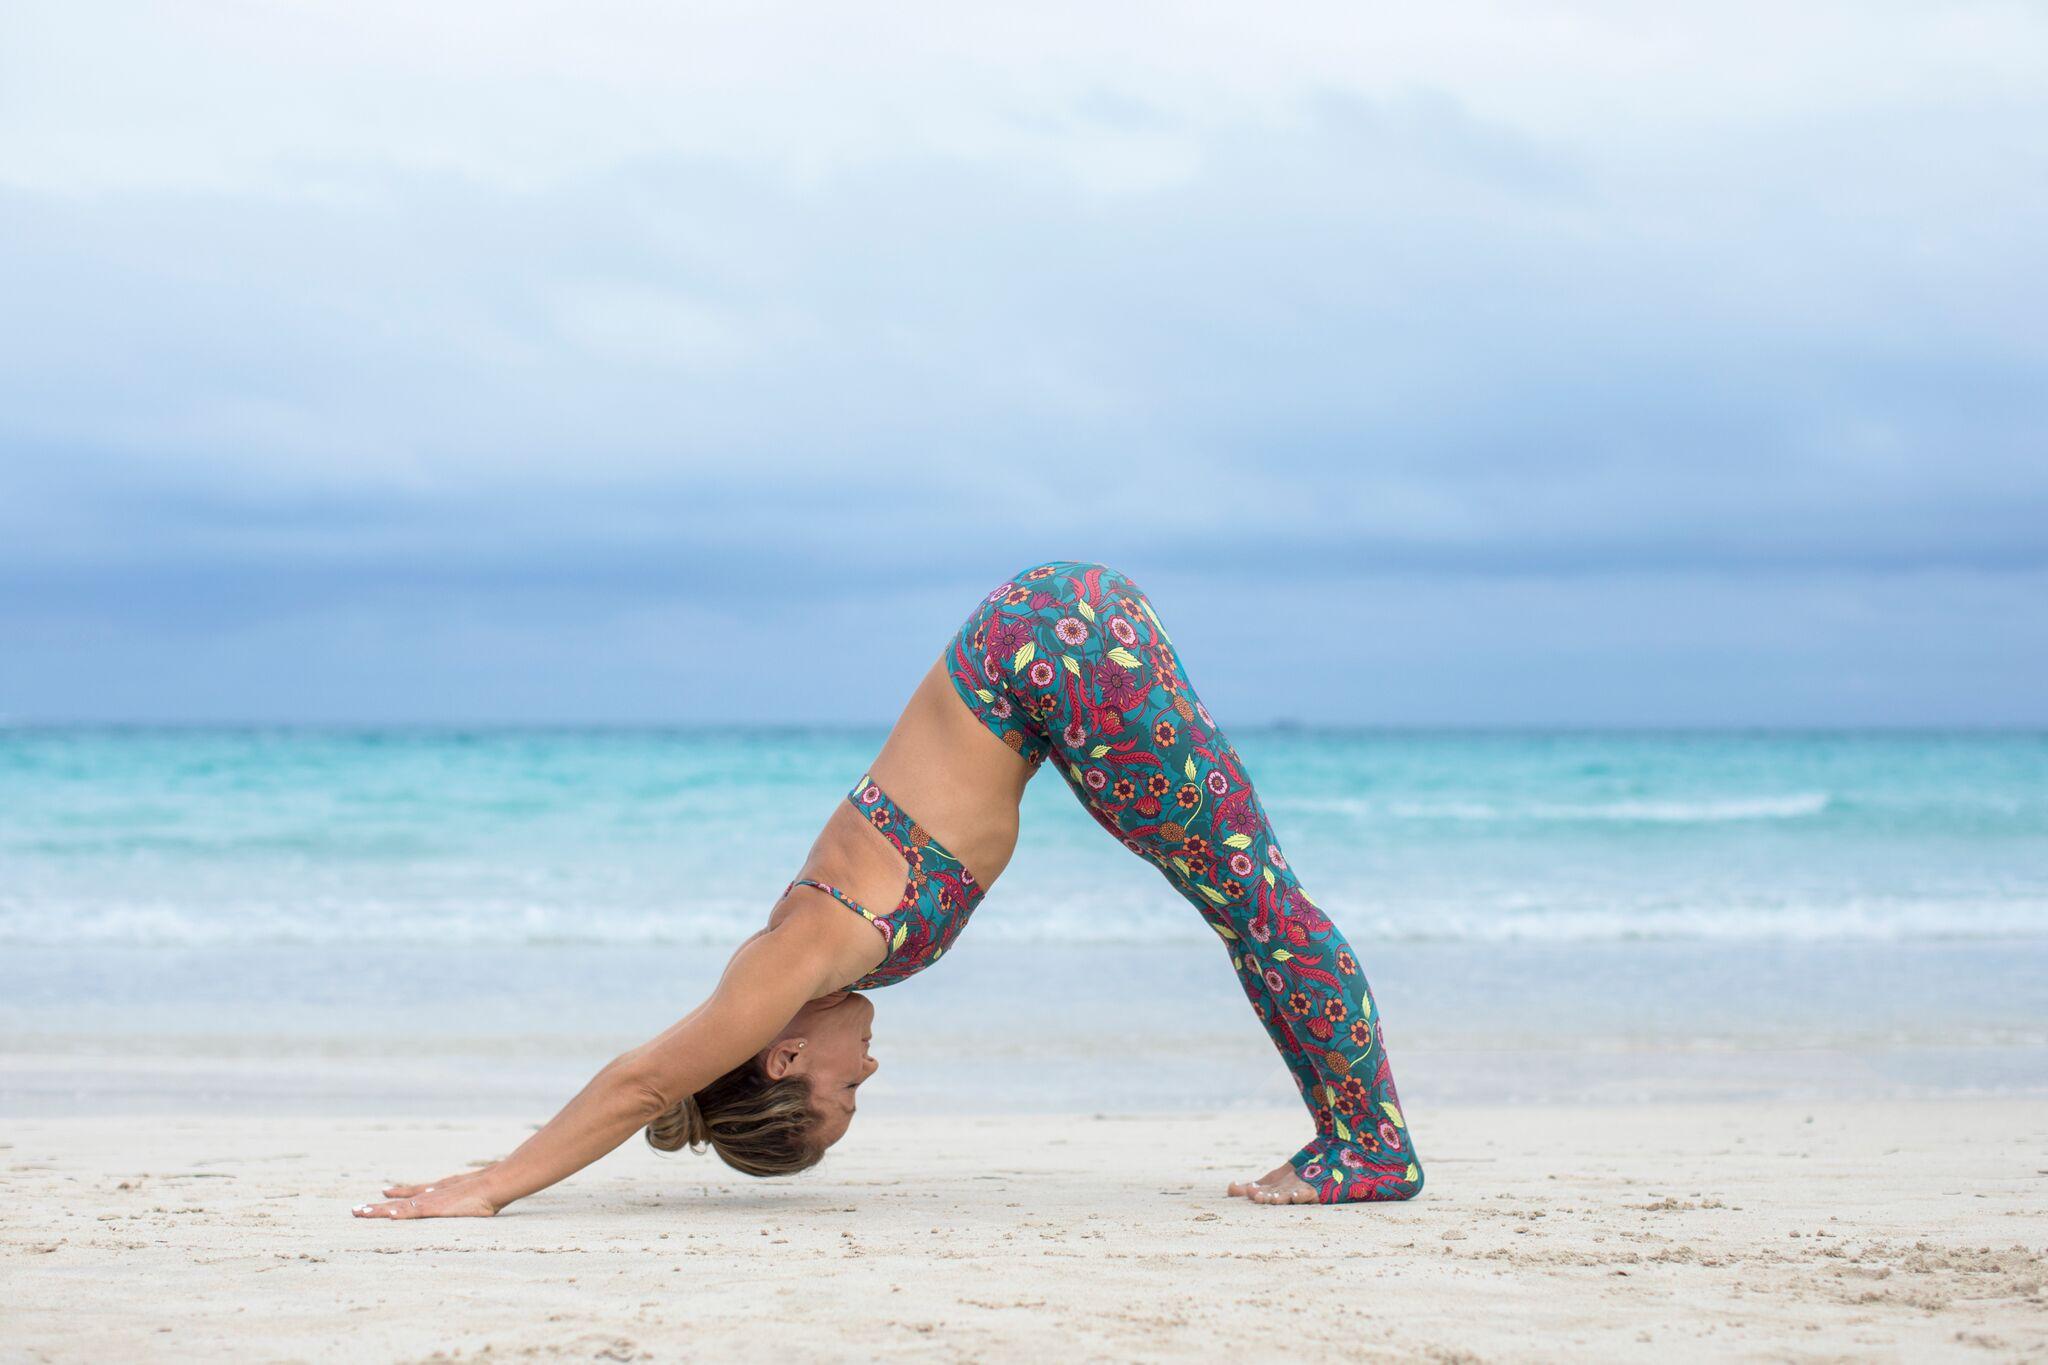 Kino Practicing Yoga